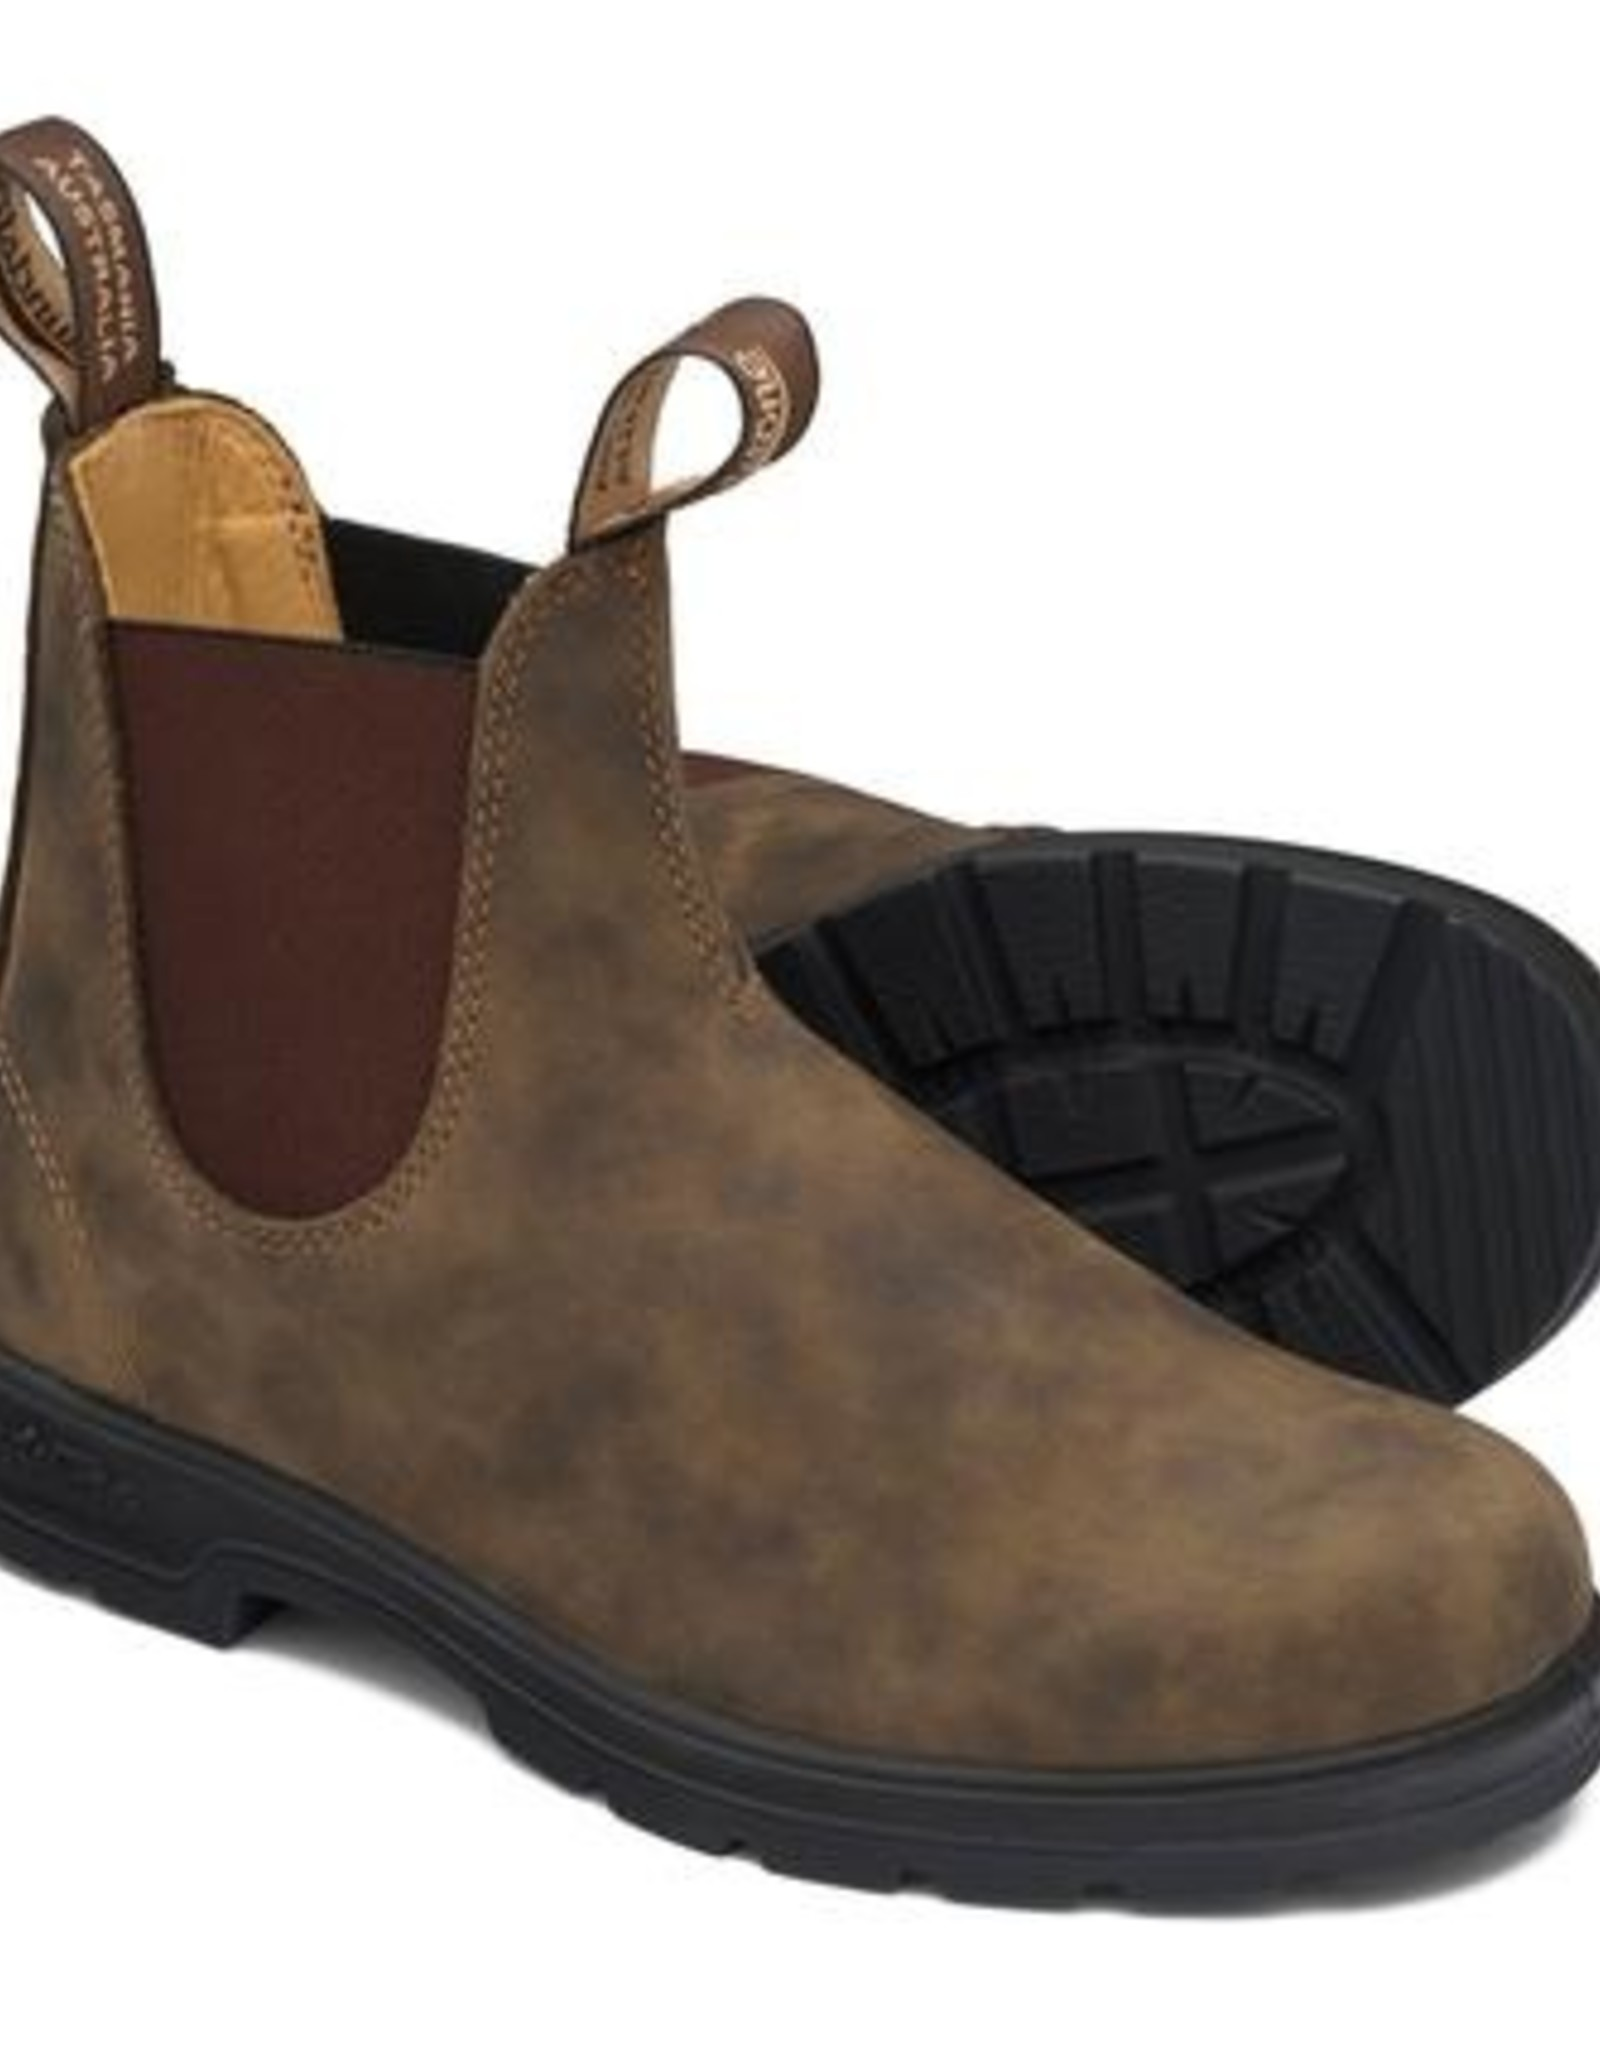 blundstone blundstone rustic brown